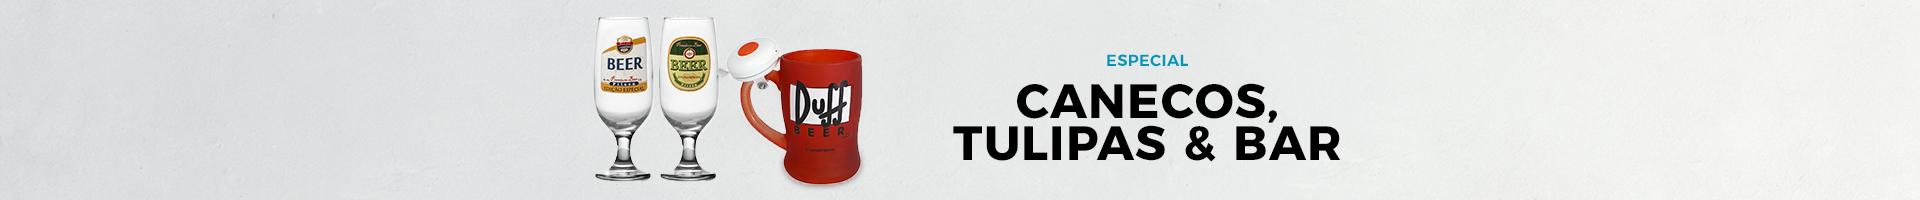 CATALOGO CANECOS TUILPAS